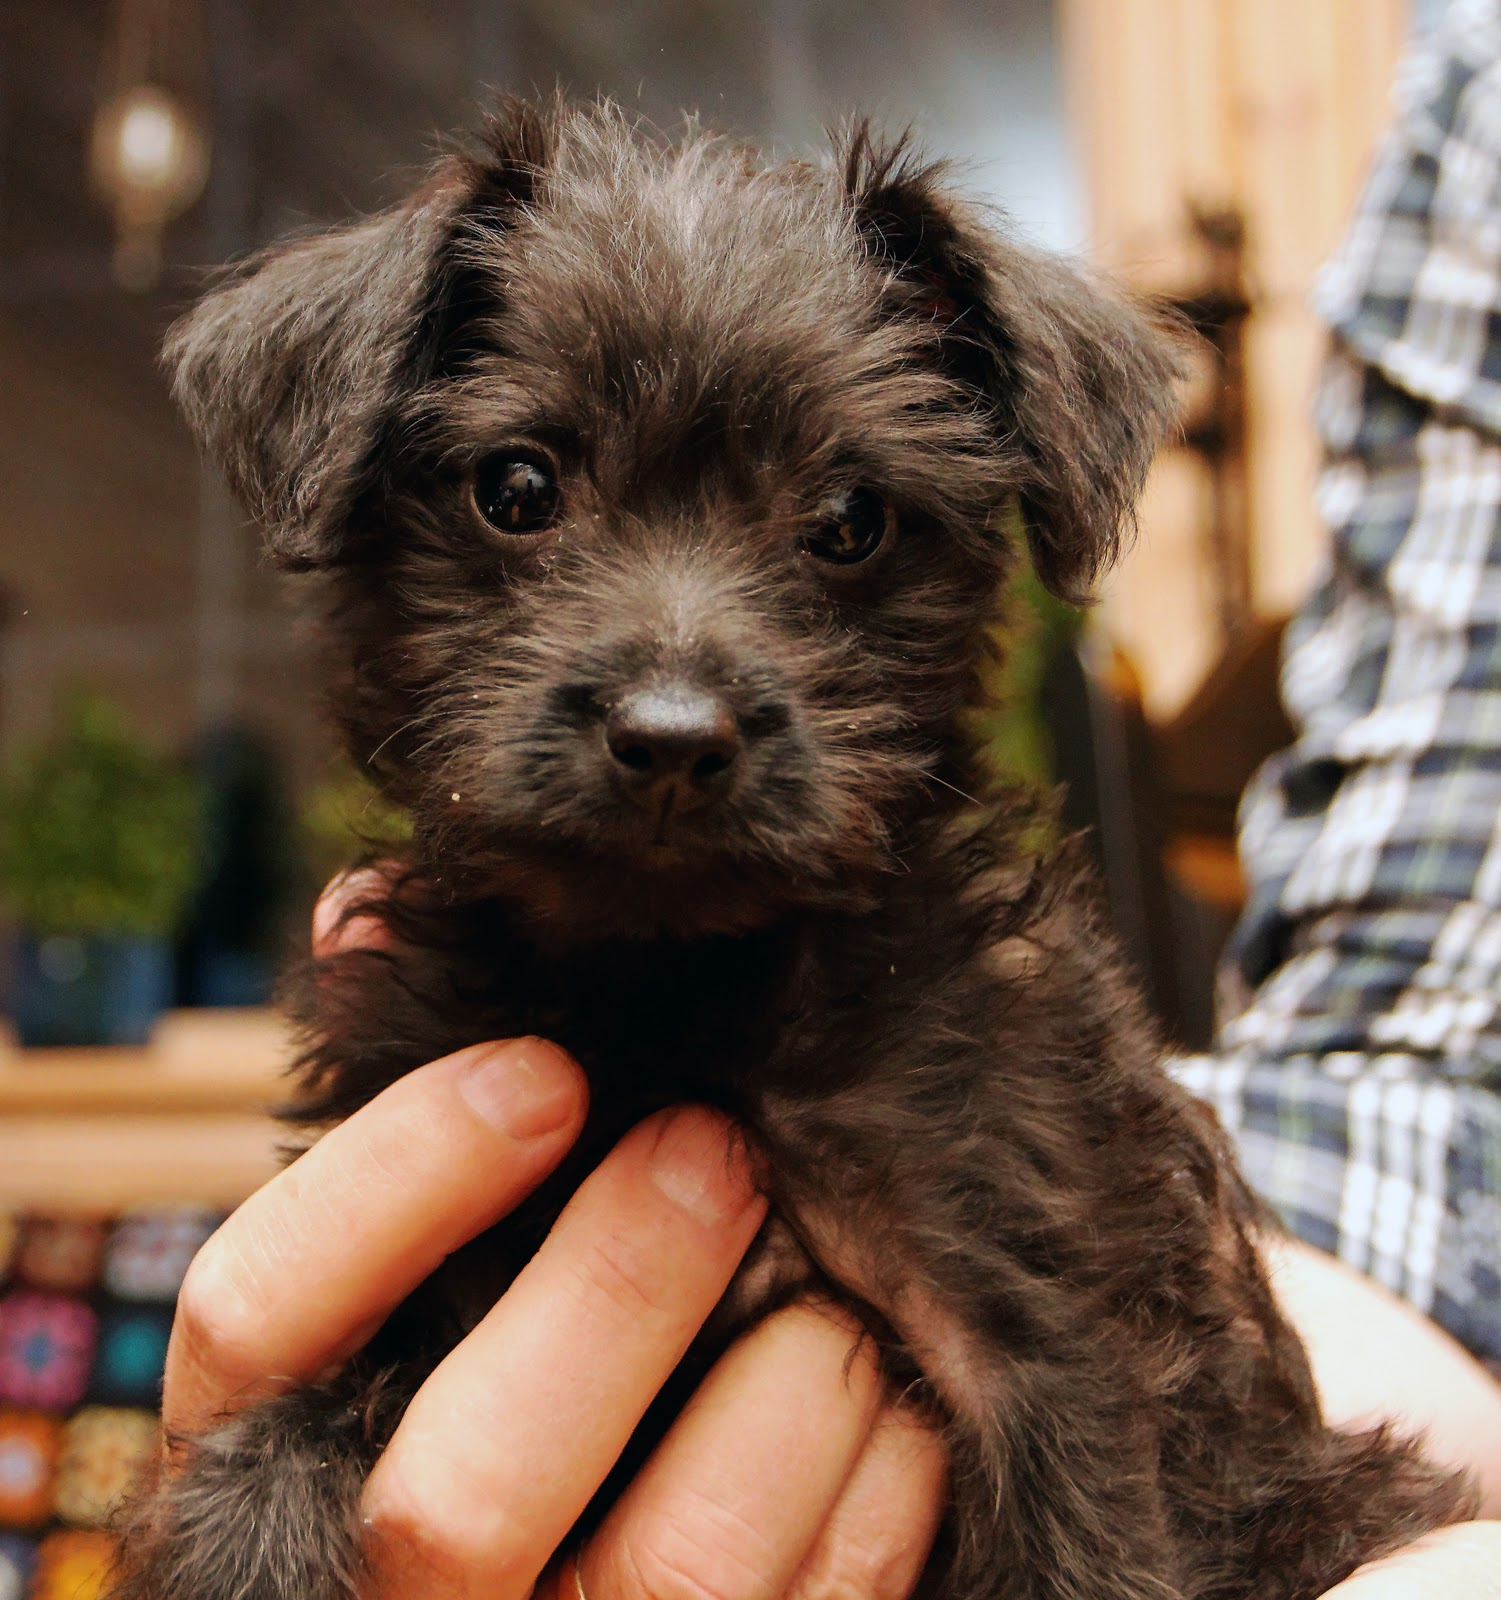 Miniature Pinscher-Miniature Poodle Mix Puppy   LYNVINGEN PHOTOS